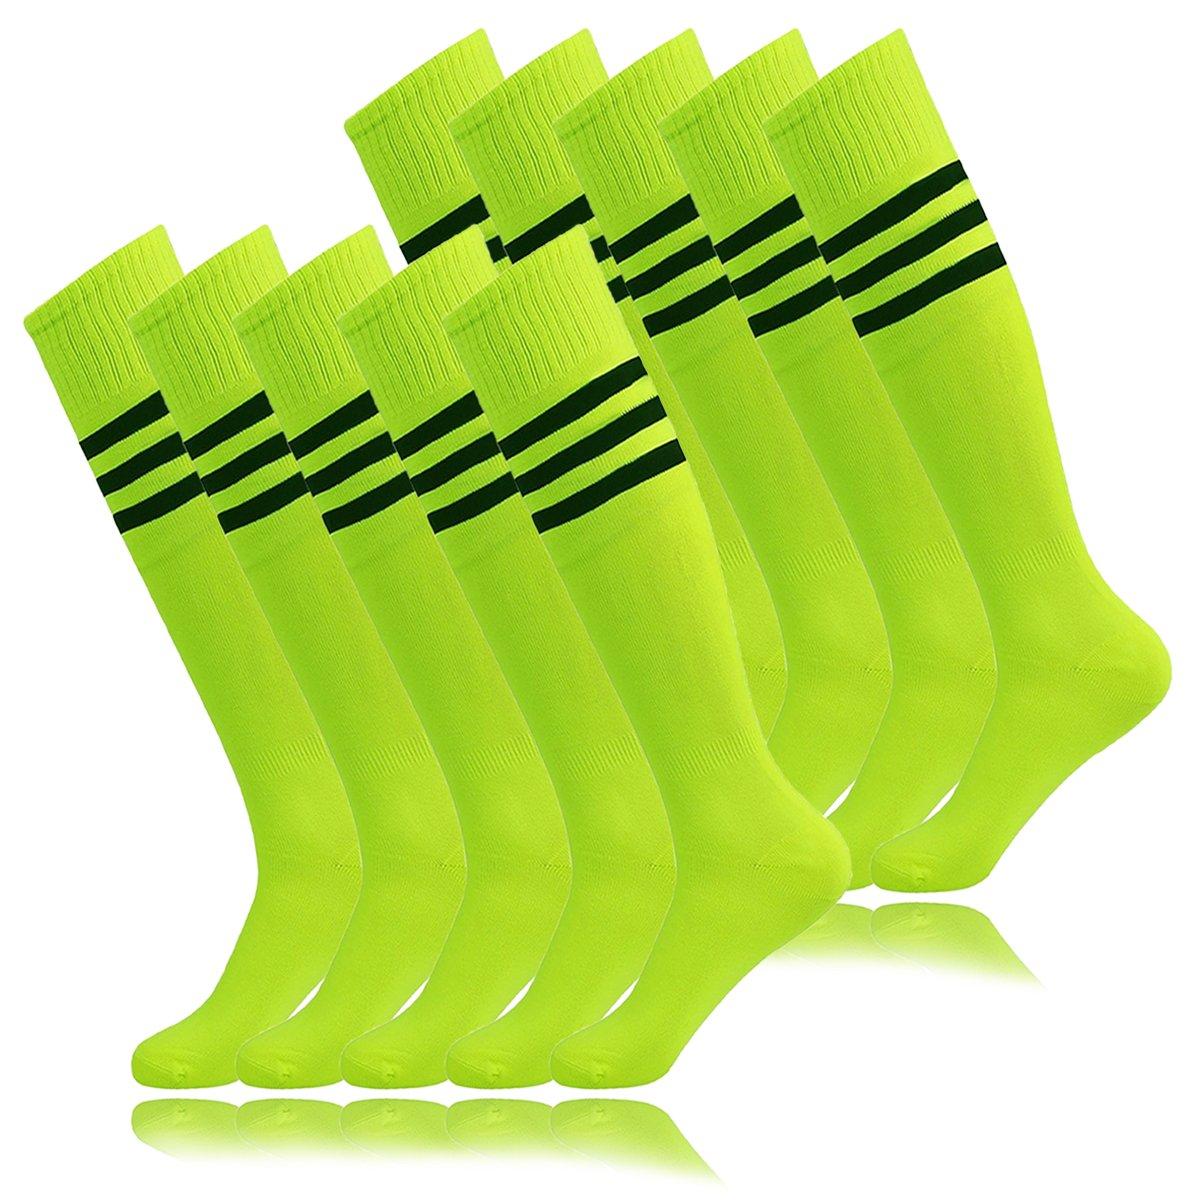 Men Baseball Softball tube Socks, Unisex Youth de correr Over The Calf Football Soccer Neon Green Yellow (10Pairs-Fluorescence Green) by MOAIR